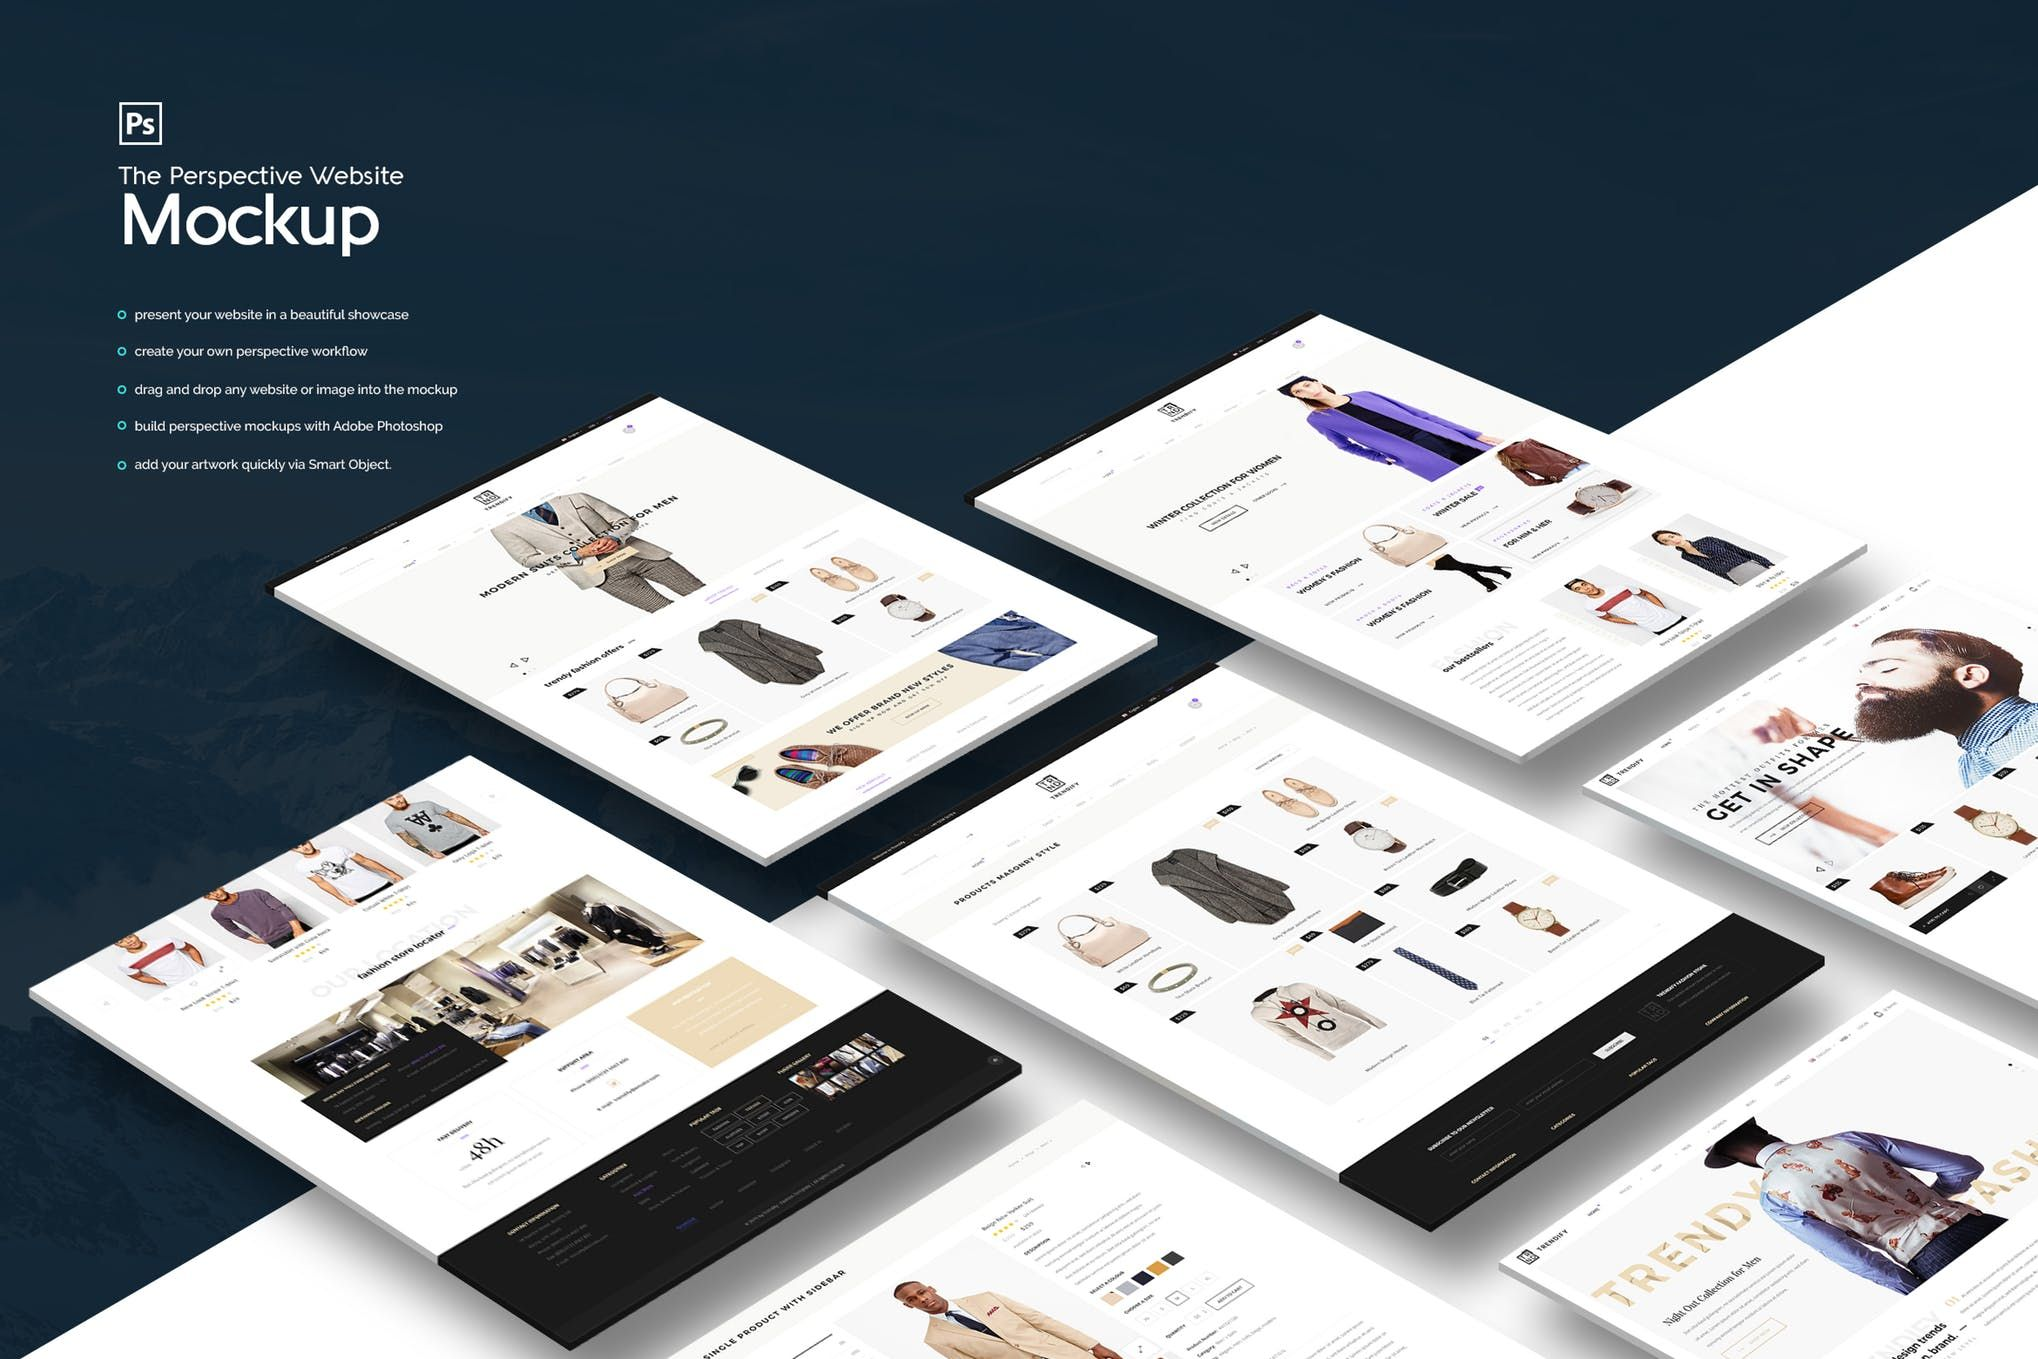 The Perspective Website Mockup   Multimedia   Mockup templates, Web